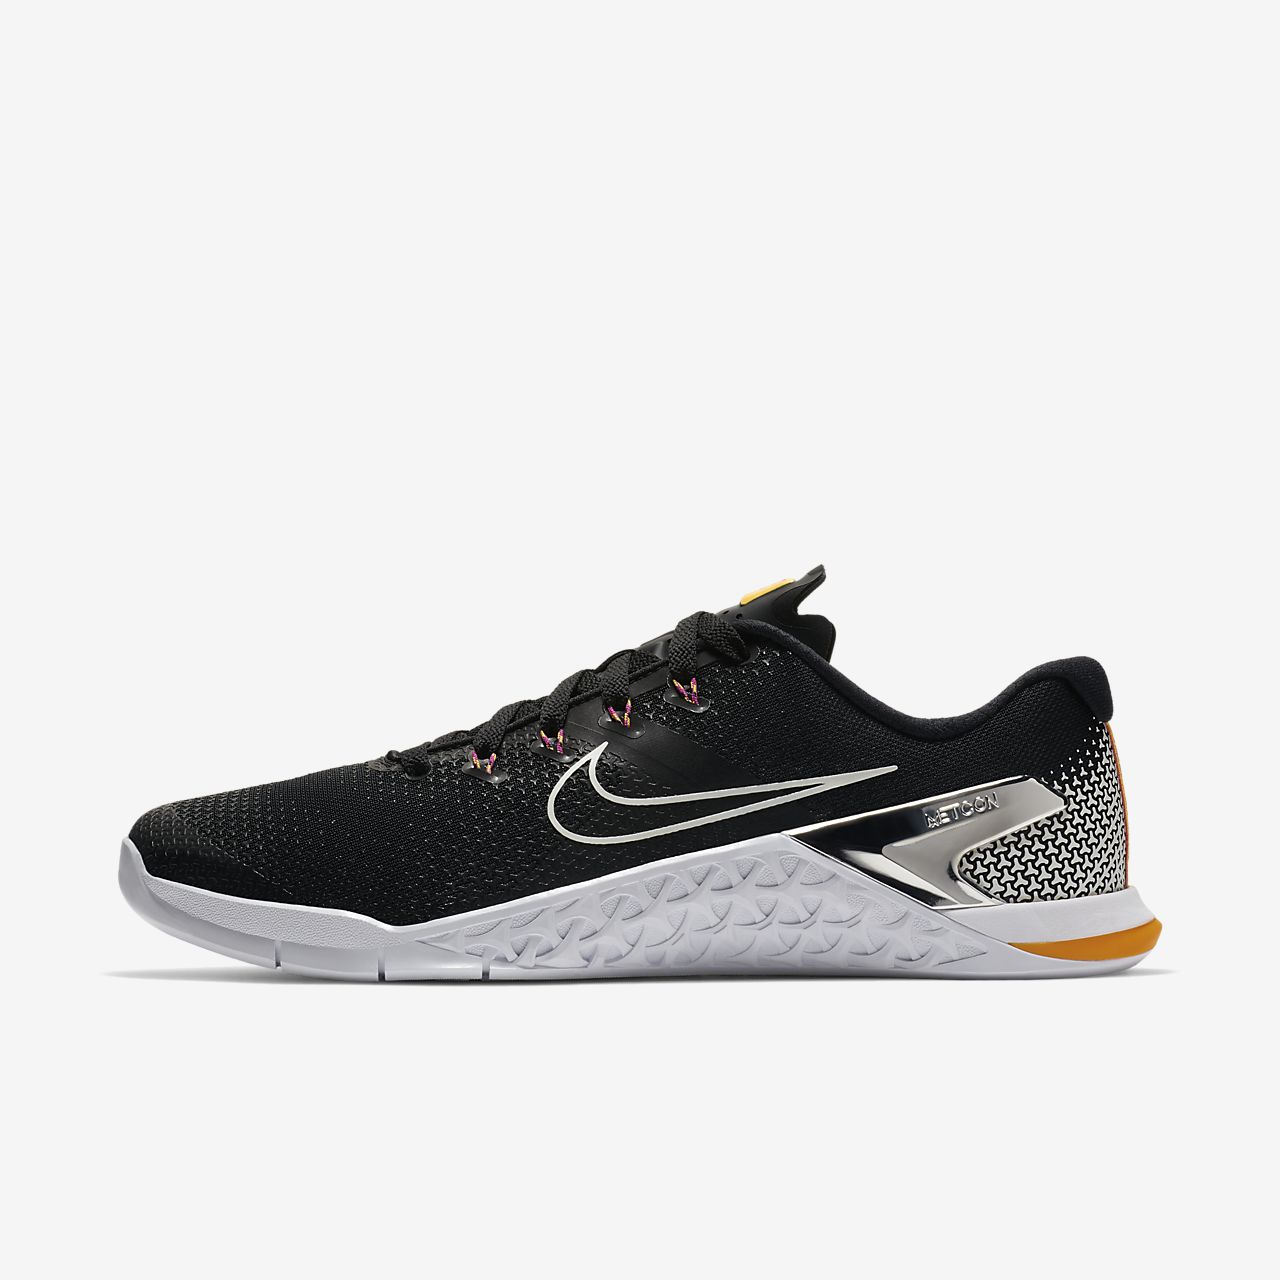 Nike Metcon 4 vs Nike Metcon 3 Training Shoe (BEST CROSSFIT